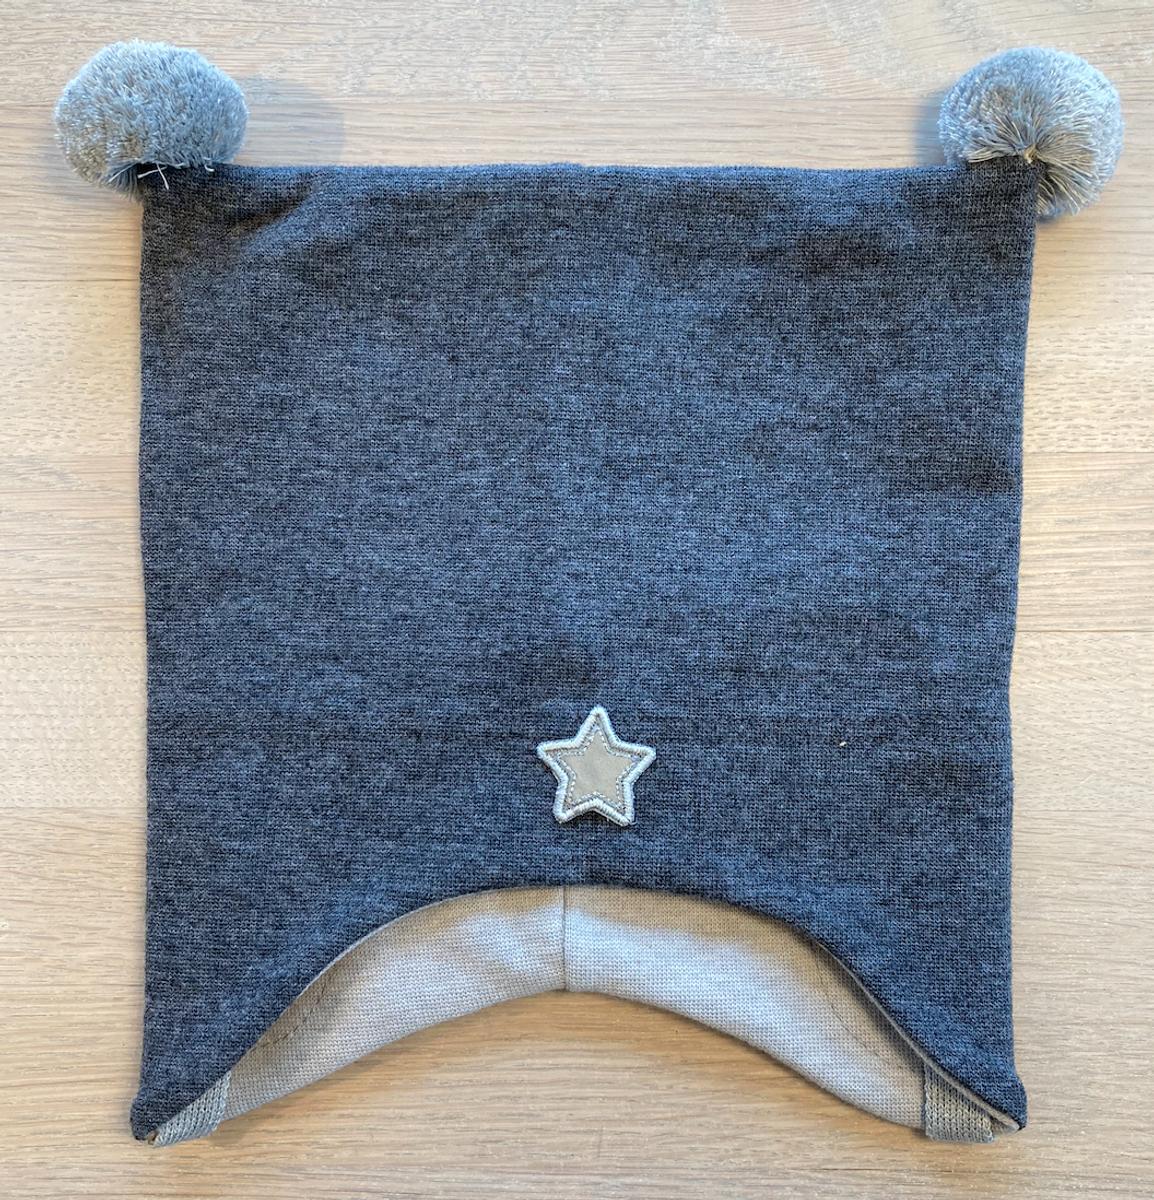 Lue cotwool knytting koksgrå med stjerne